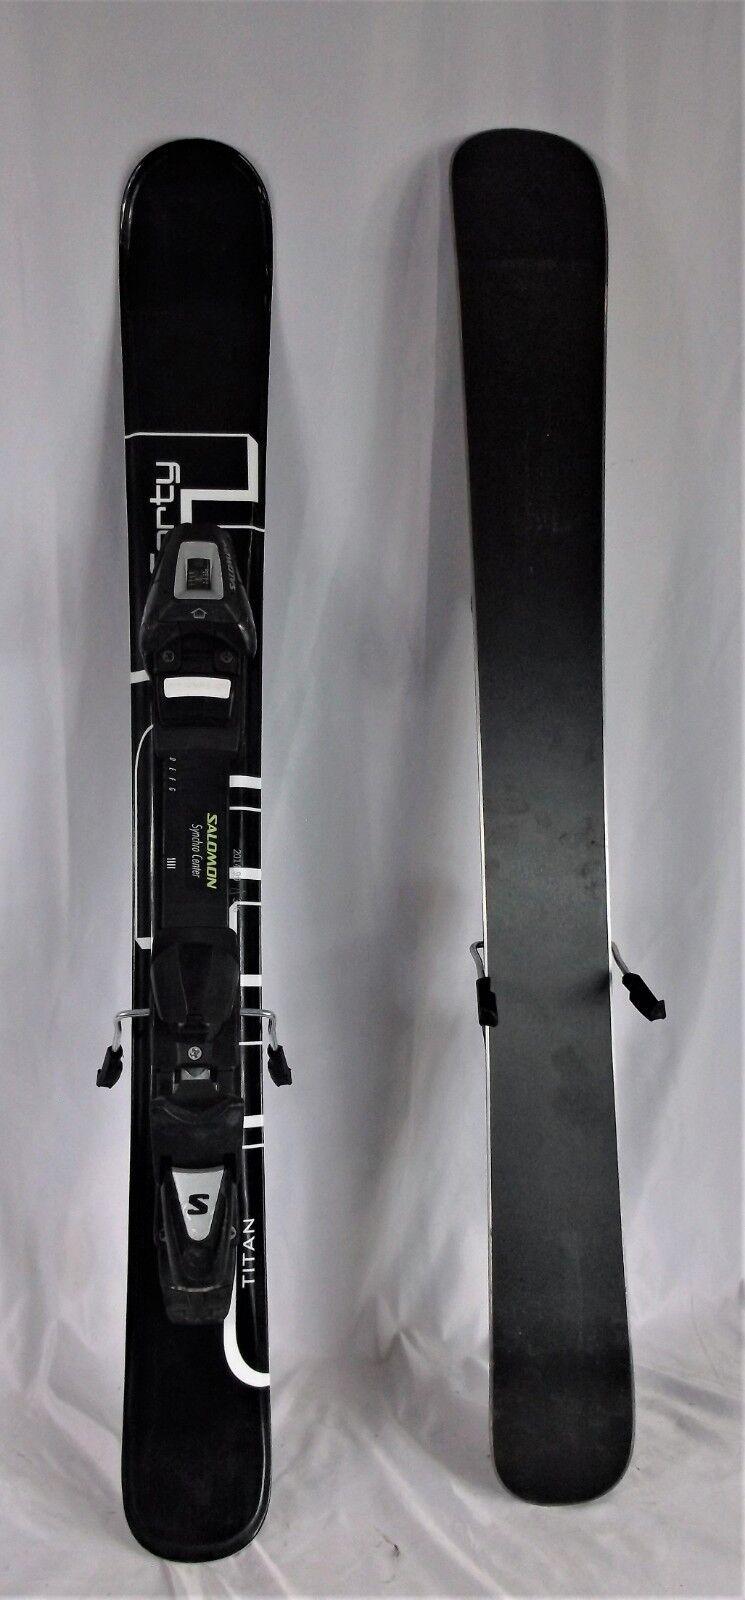 New Adult,Snowblade,FiveFourty,Ski Blade,99cm,USED STEP IN Salomon bindings, FIT